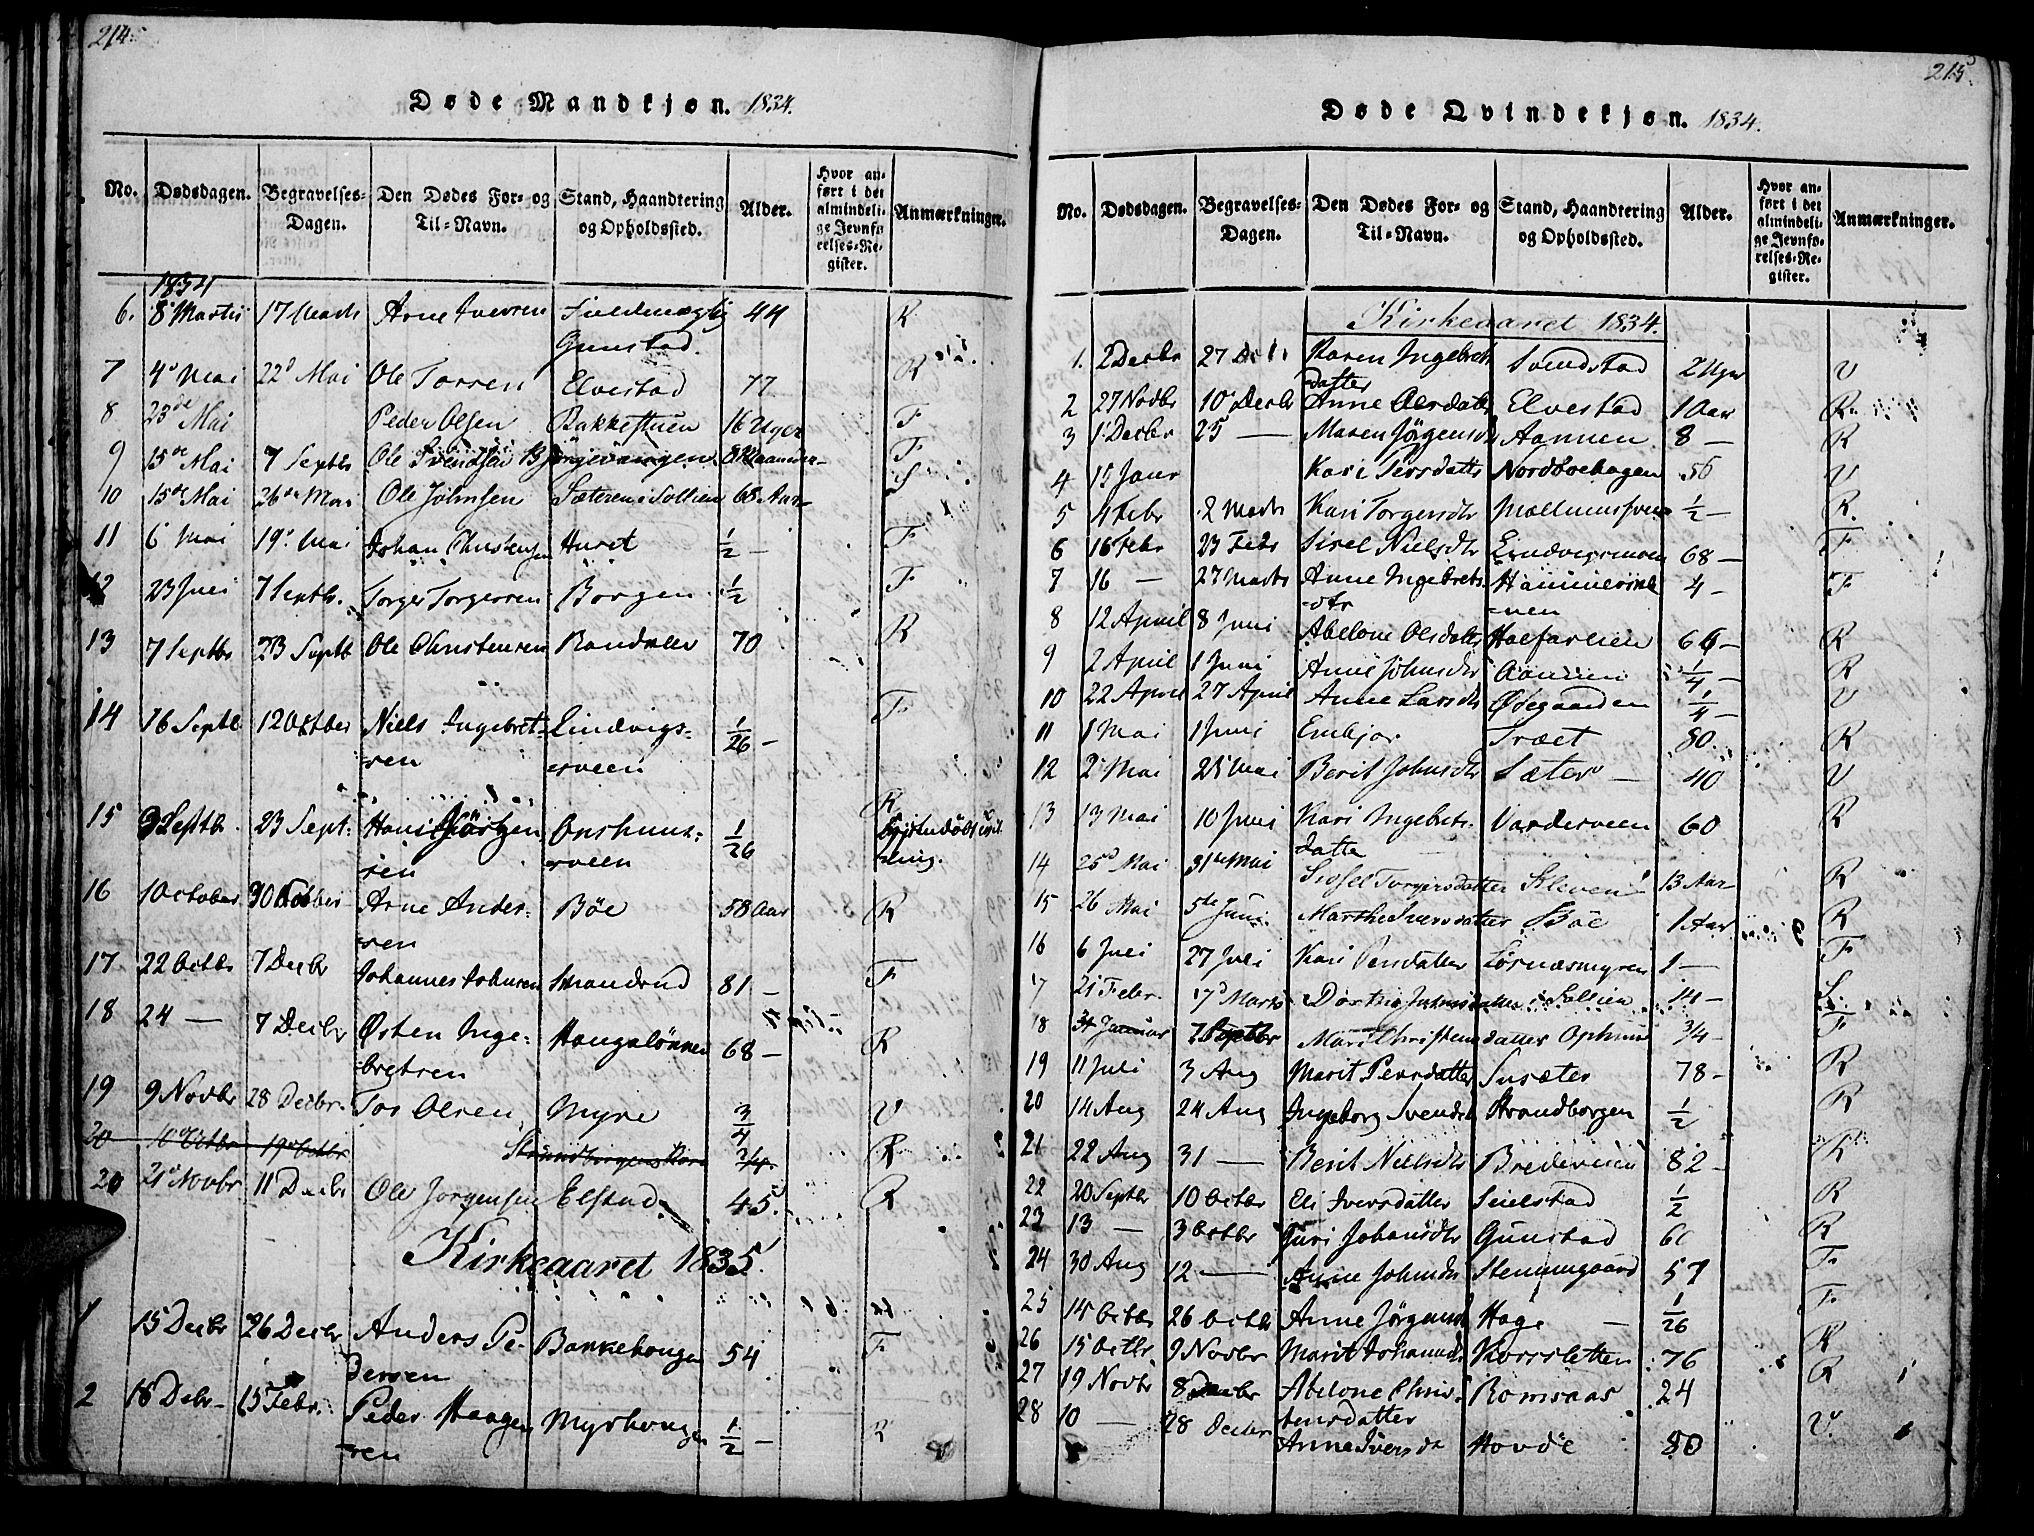 SAH, Ringebu prestekontor, Ministerialbok nr. 4, 1821-1839, s. 214-215